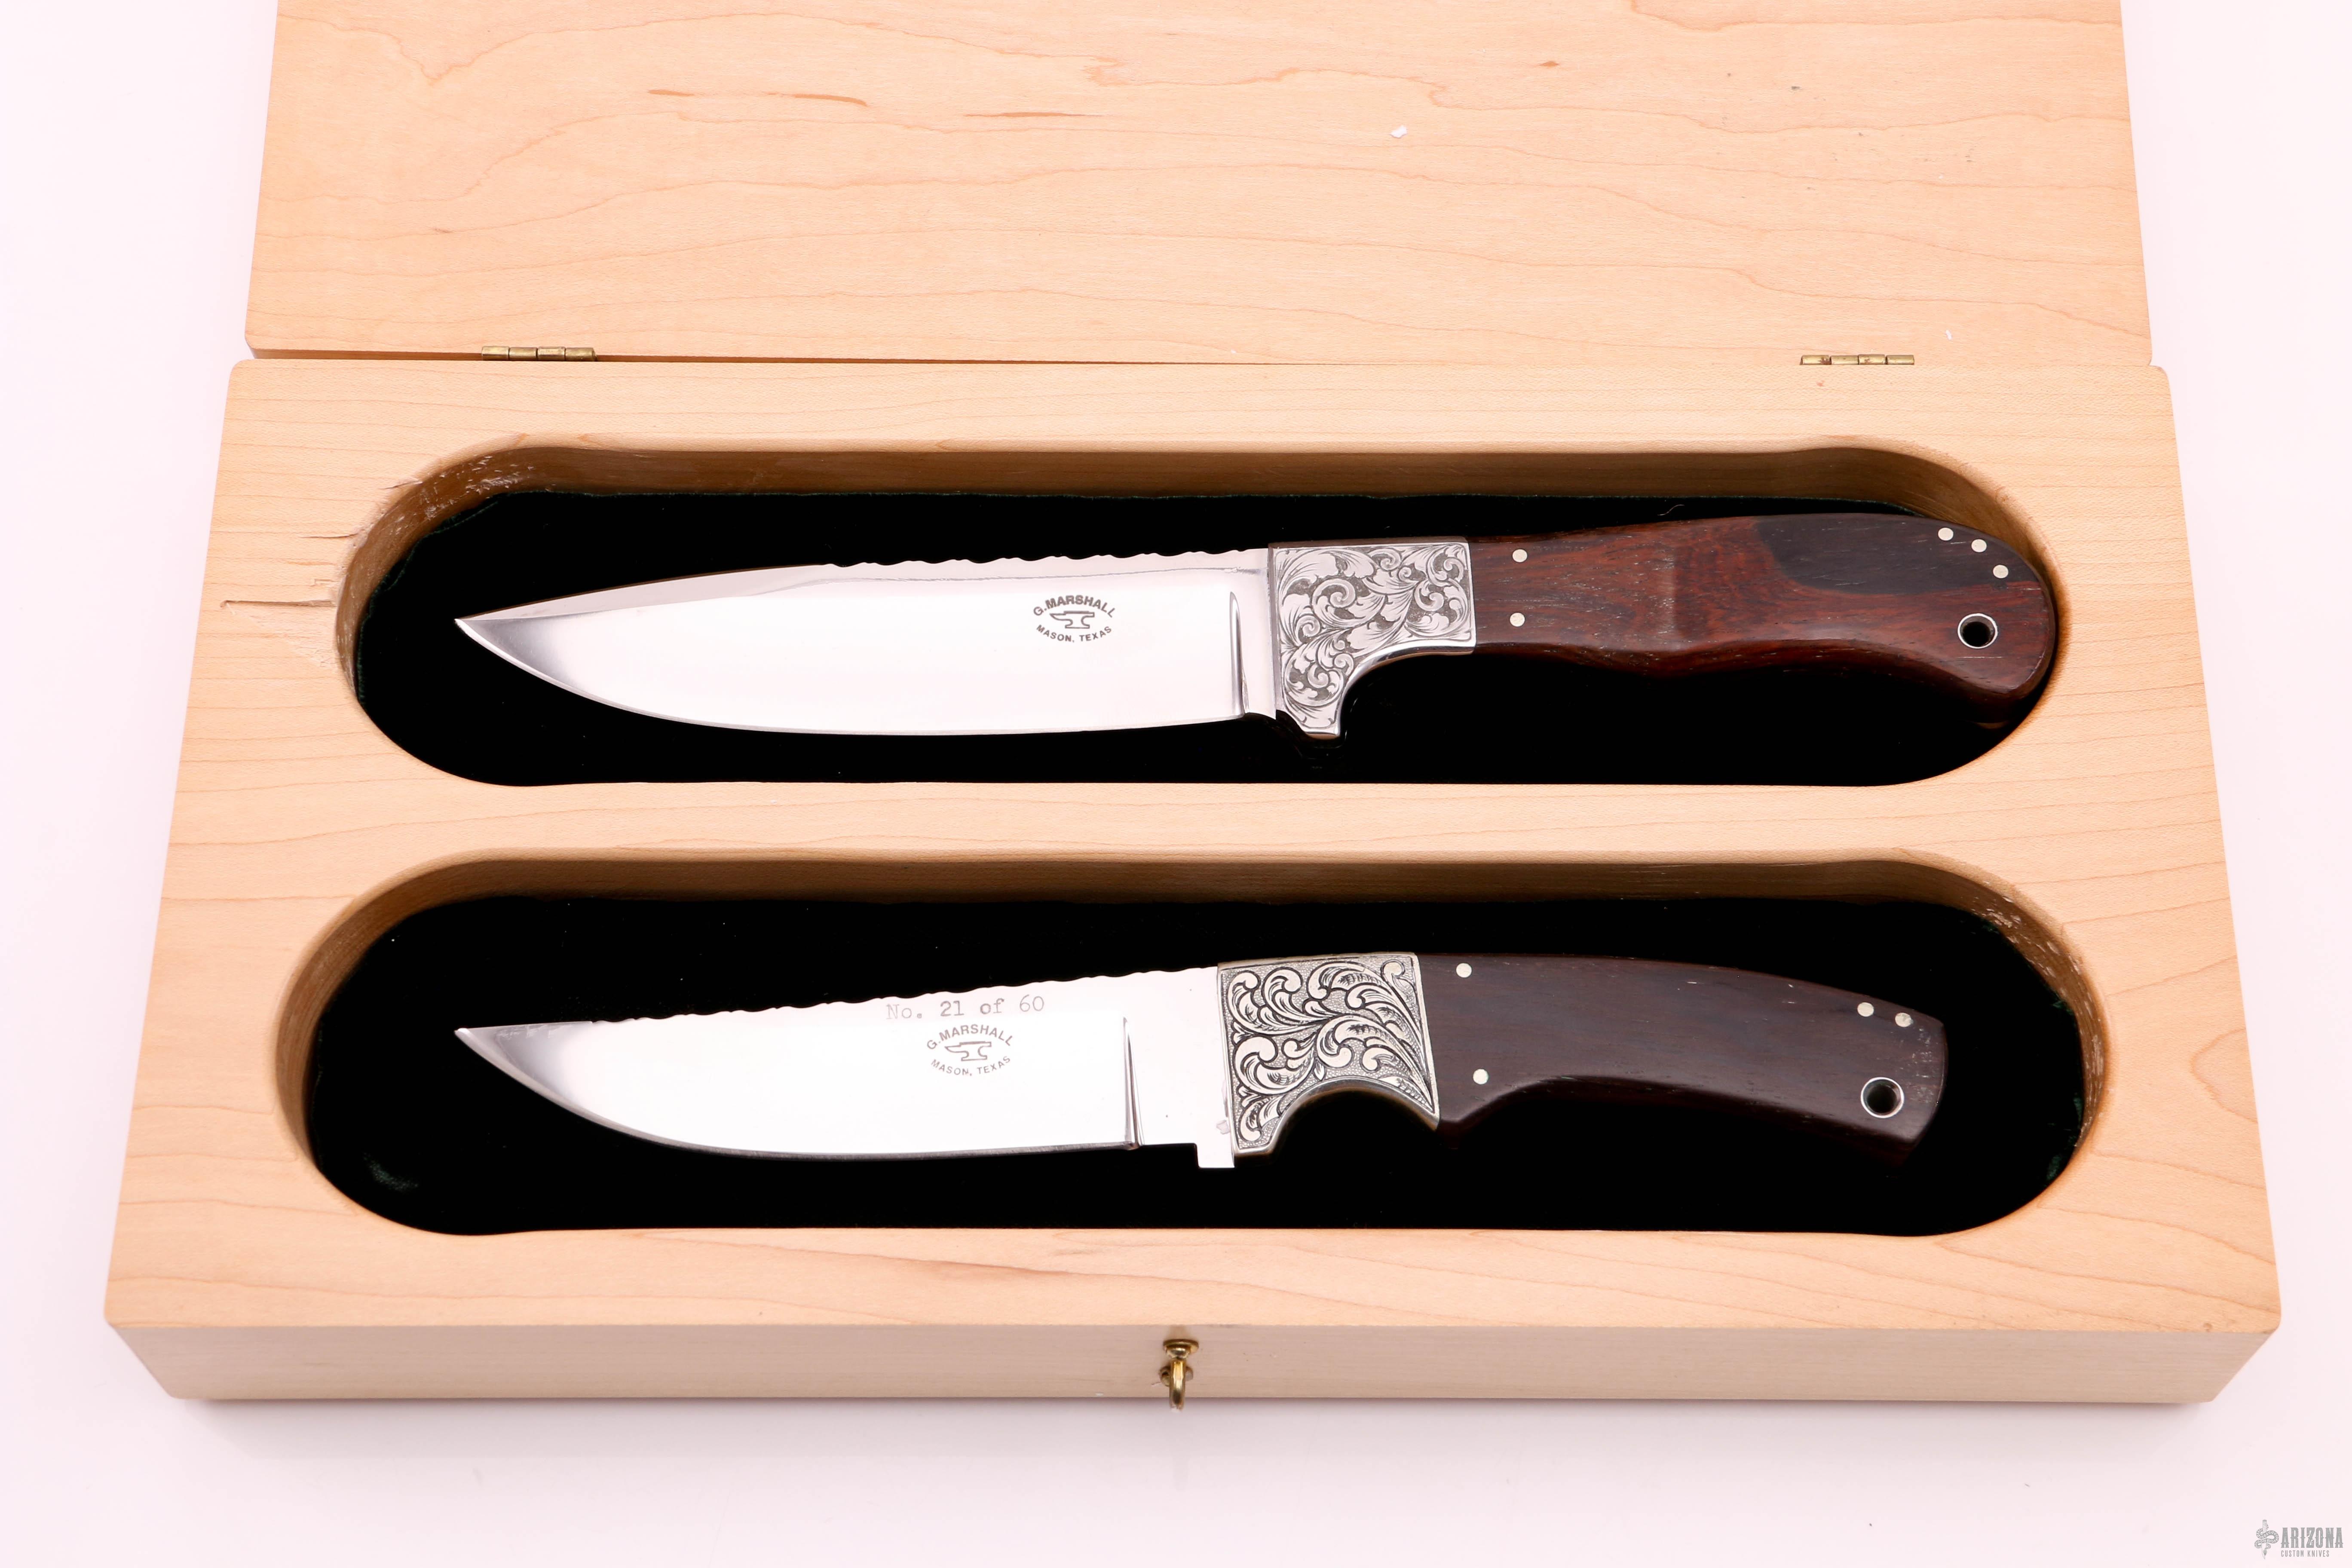 60 And 70 Year Commemorative Set One Of A Kind Arizona Custom Knives